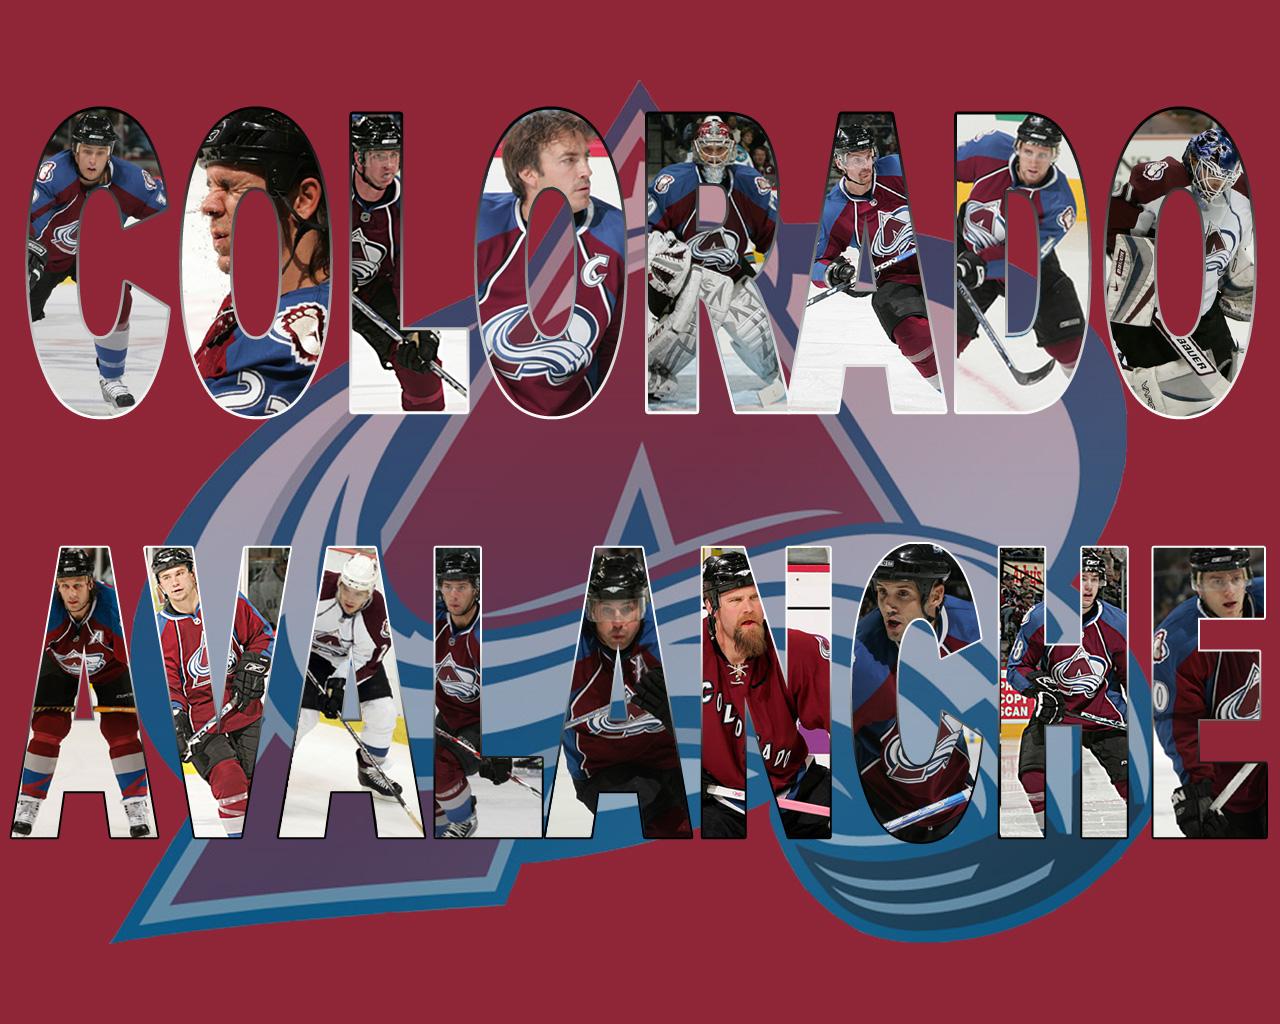 Colorado Avalanche Team Wallpaper 12801024 181232 HD Wallpaper Res 1280x1024